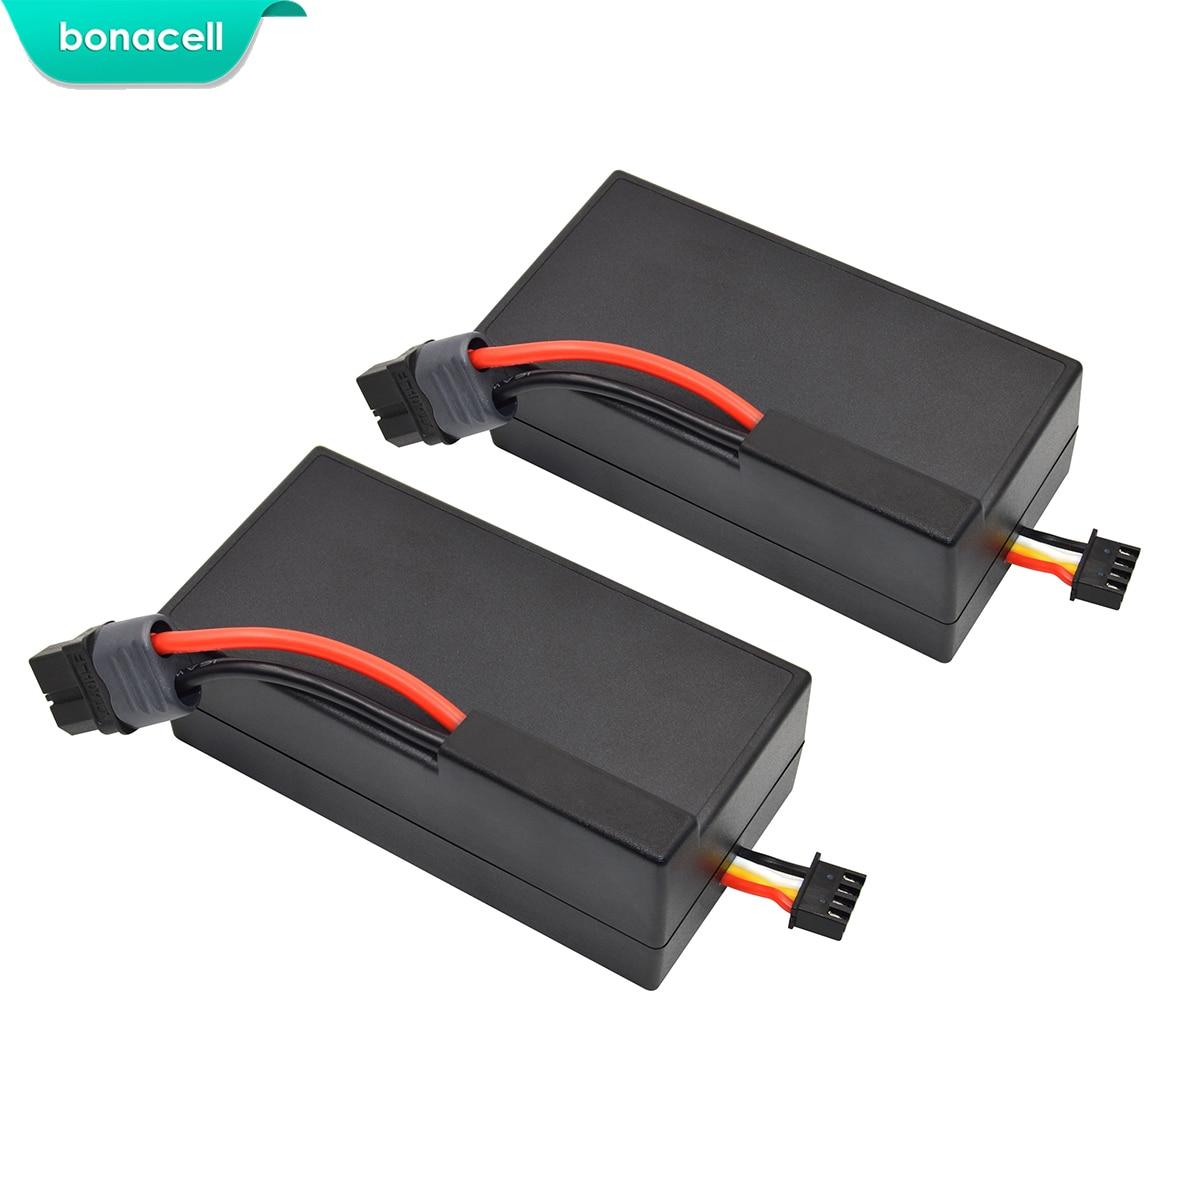 Bonacell 2700mAh Rechargeable UAV battery For Parrot Disco Li-ion 11.1v Lithium-ion Polymer Rechargeable Battery L10Bonacell 2700mAh Rechargeable UAV battery For Parrot Disco Li-ion 11.1v Lithium-ion Polymer Rechargeable Battery L10